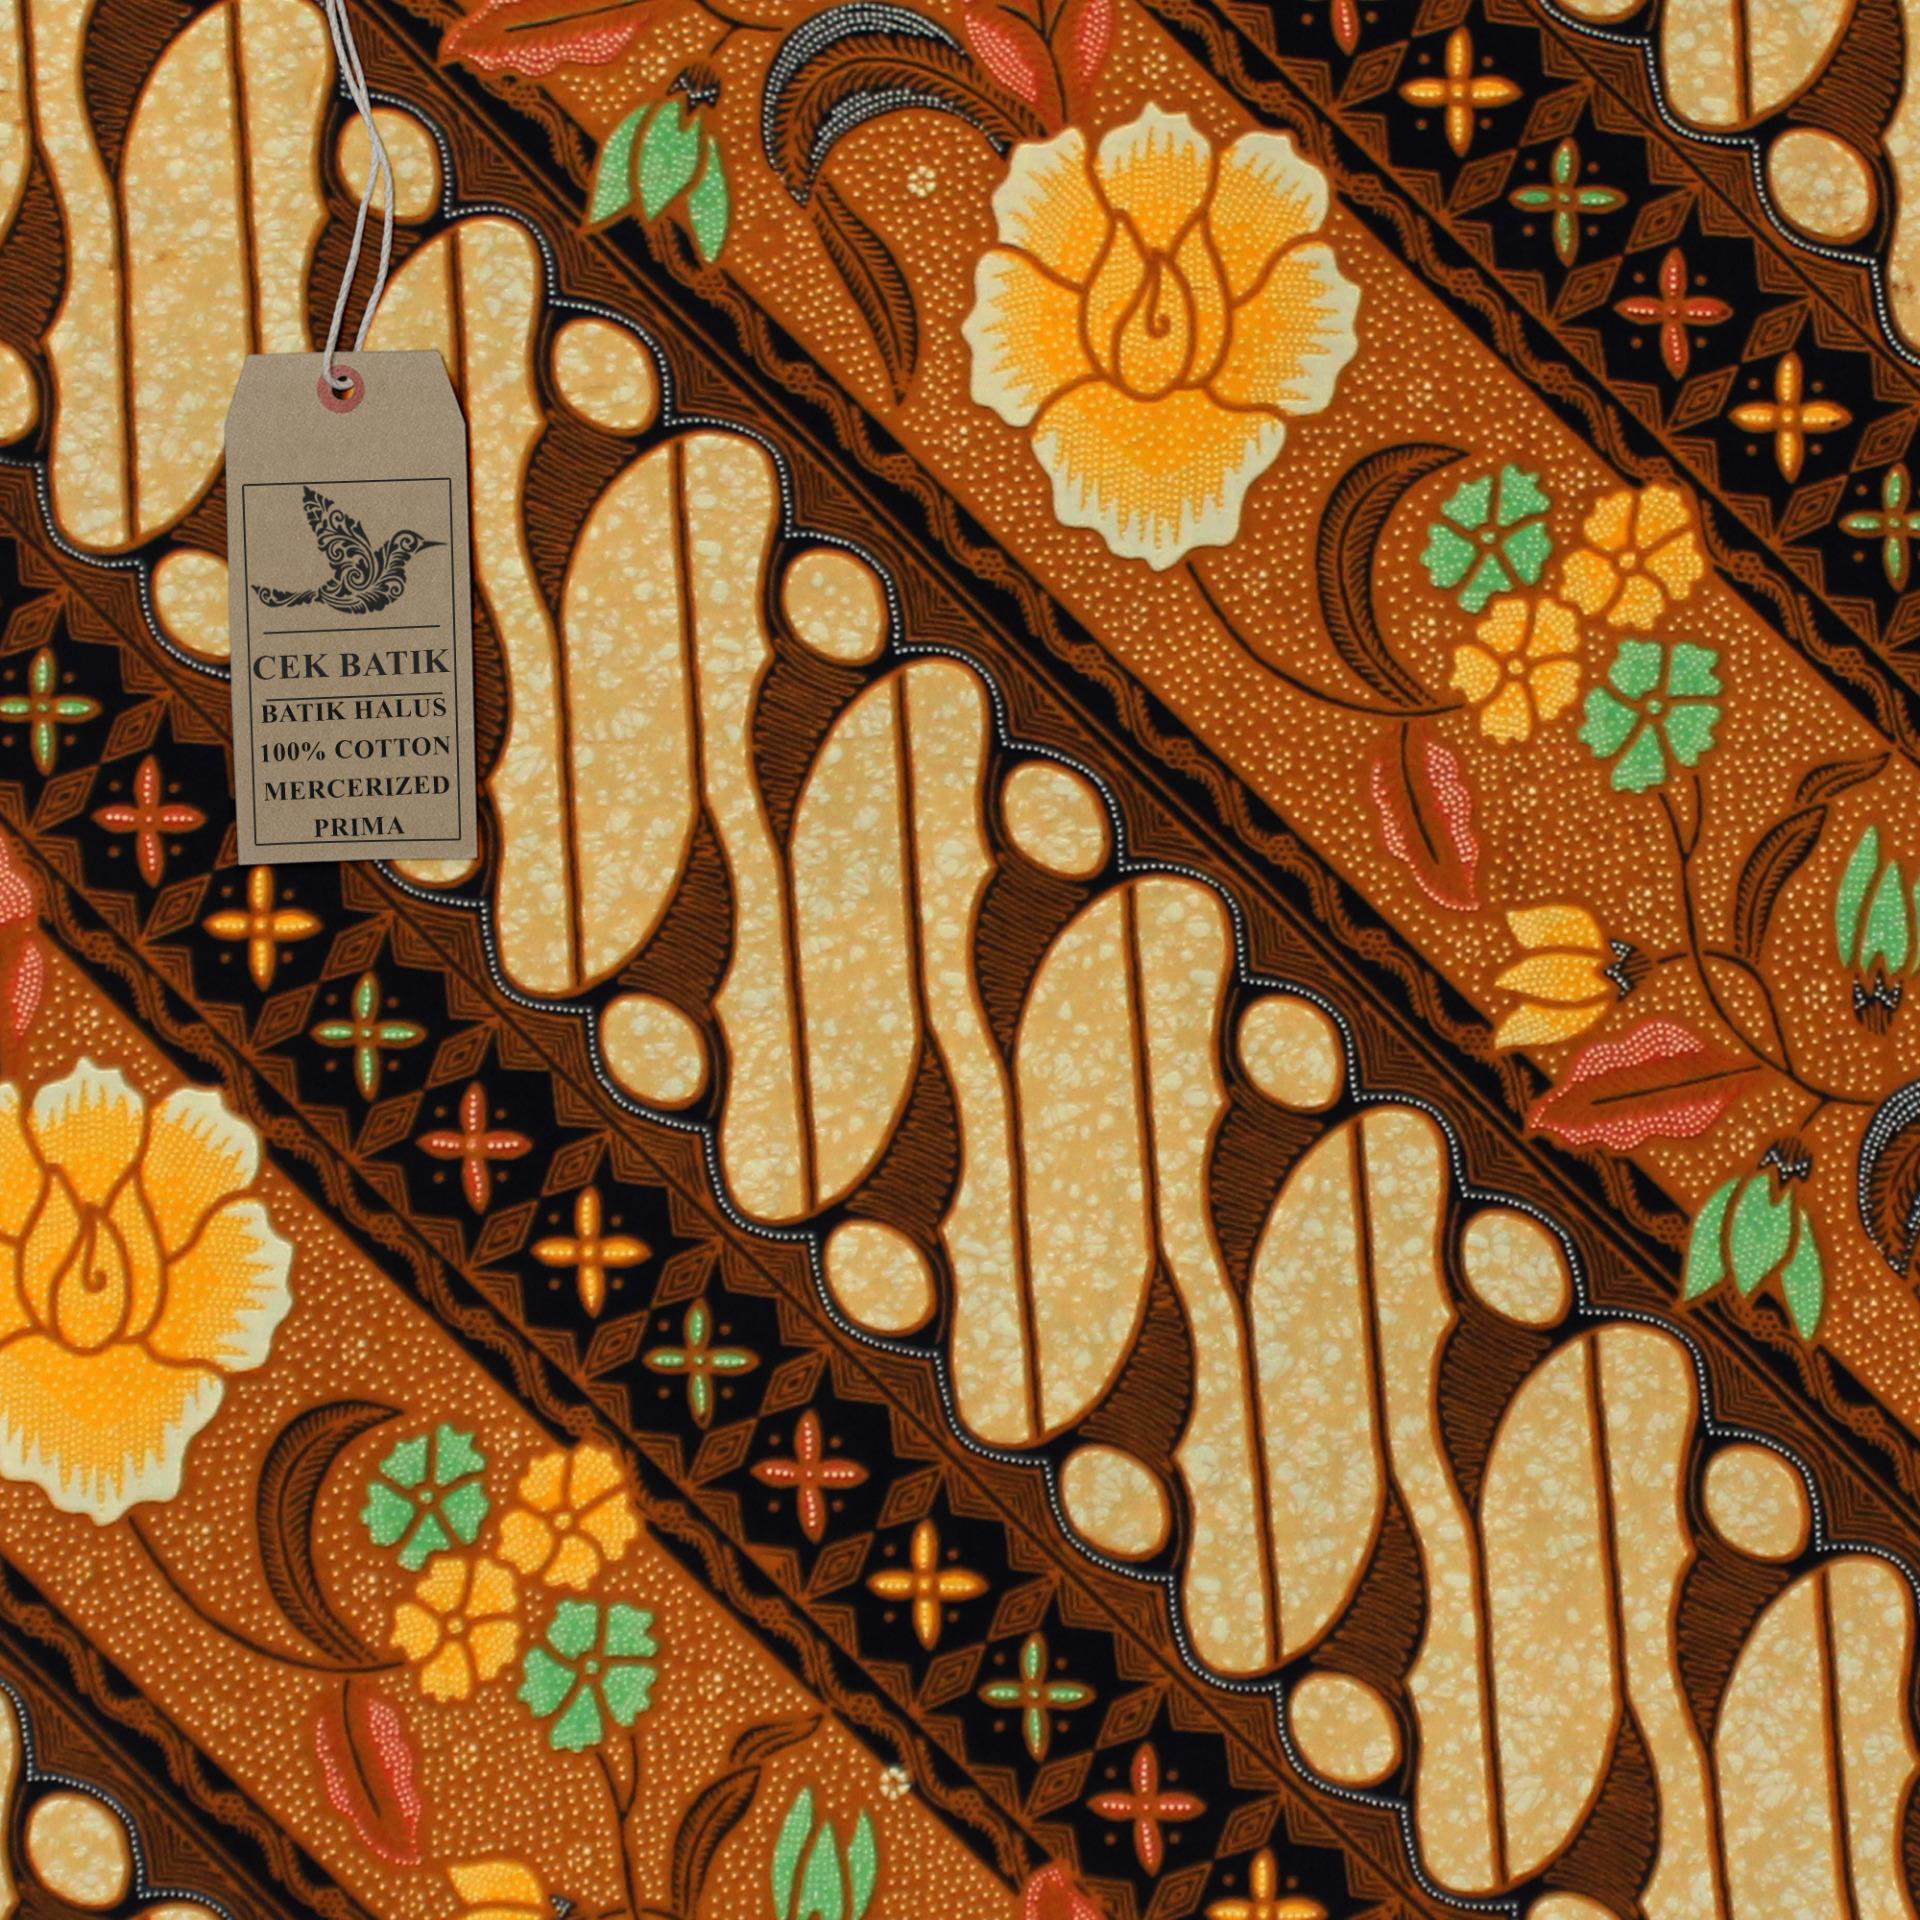 Cek Batik - Kain Batik Motif Etnik & Modern Pesona Parang Bunga Gading (Coklat Muda)